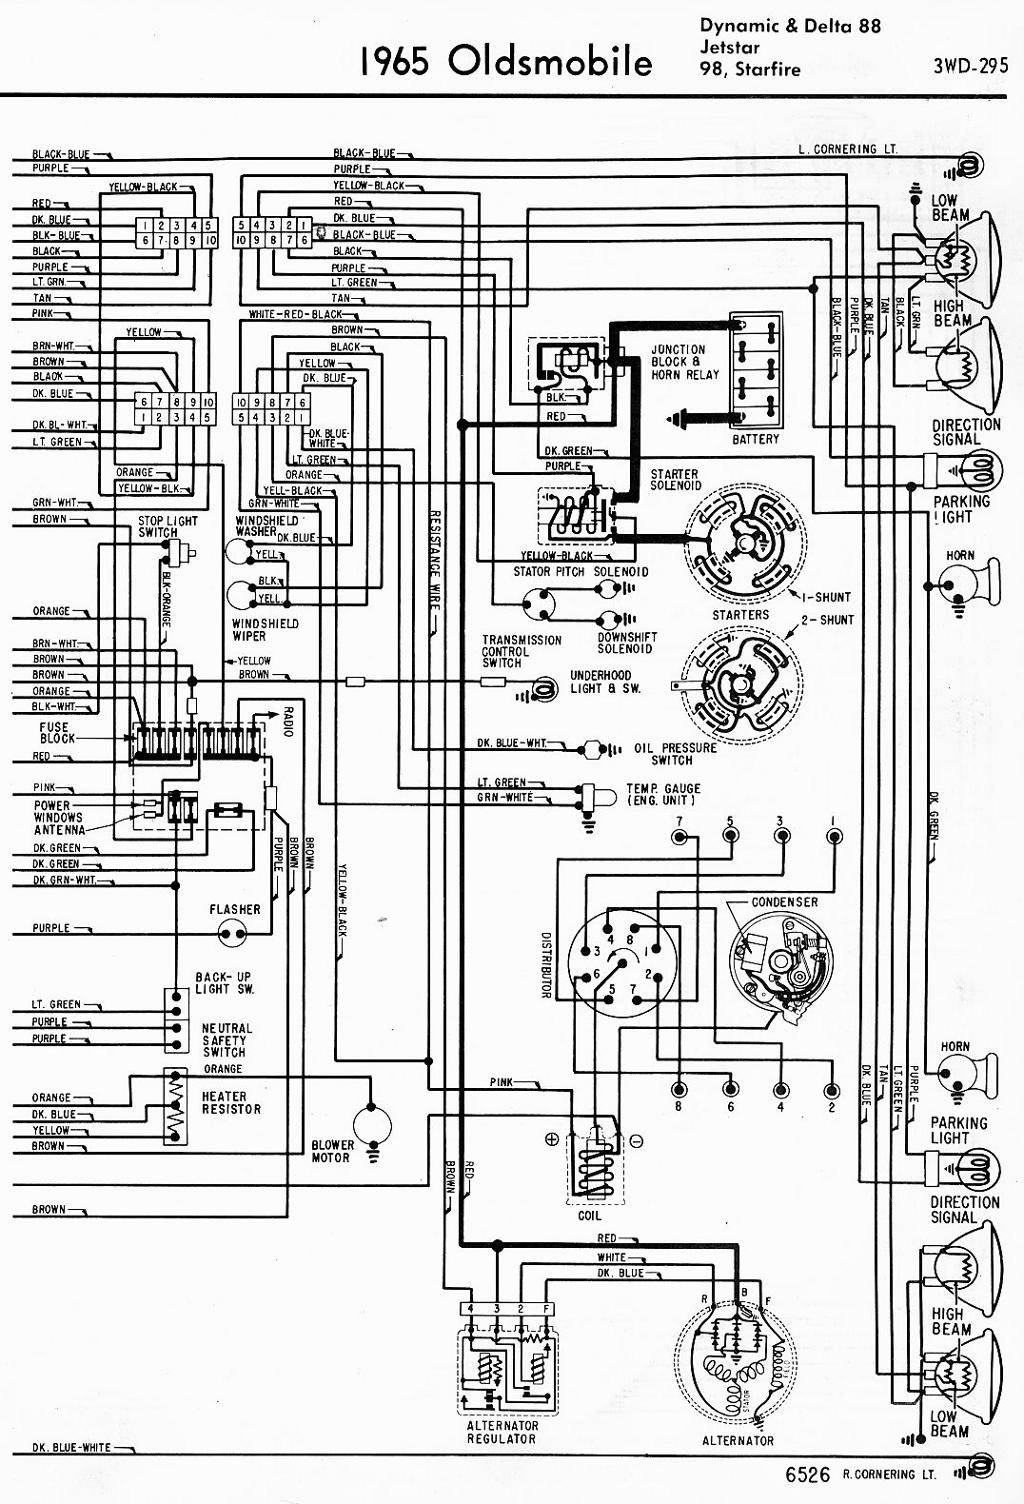 Nissan Y11 Wiring Diagram : Nissan versa wiring diagram autos post